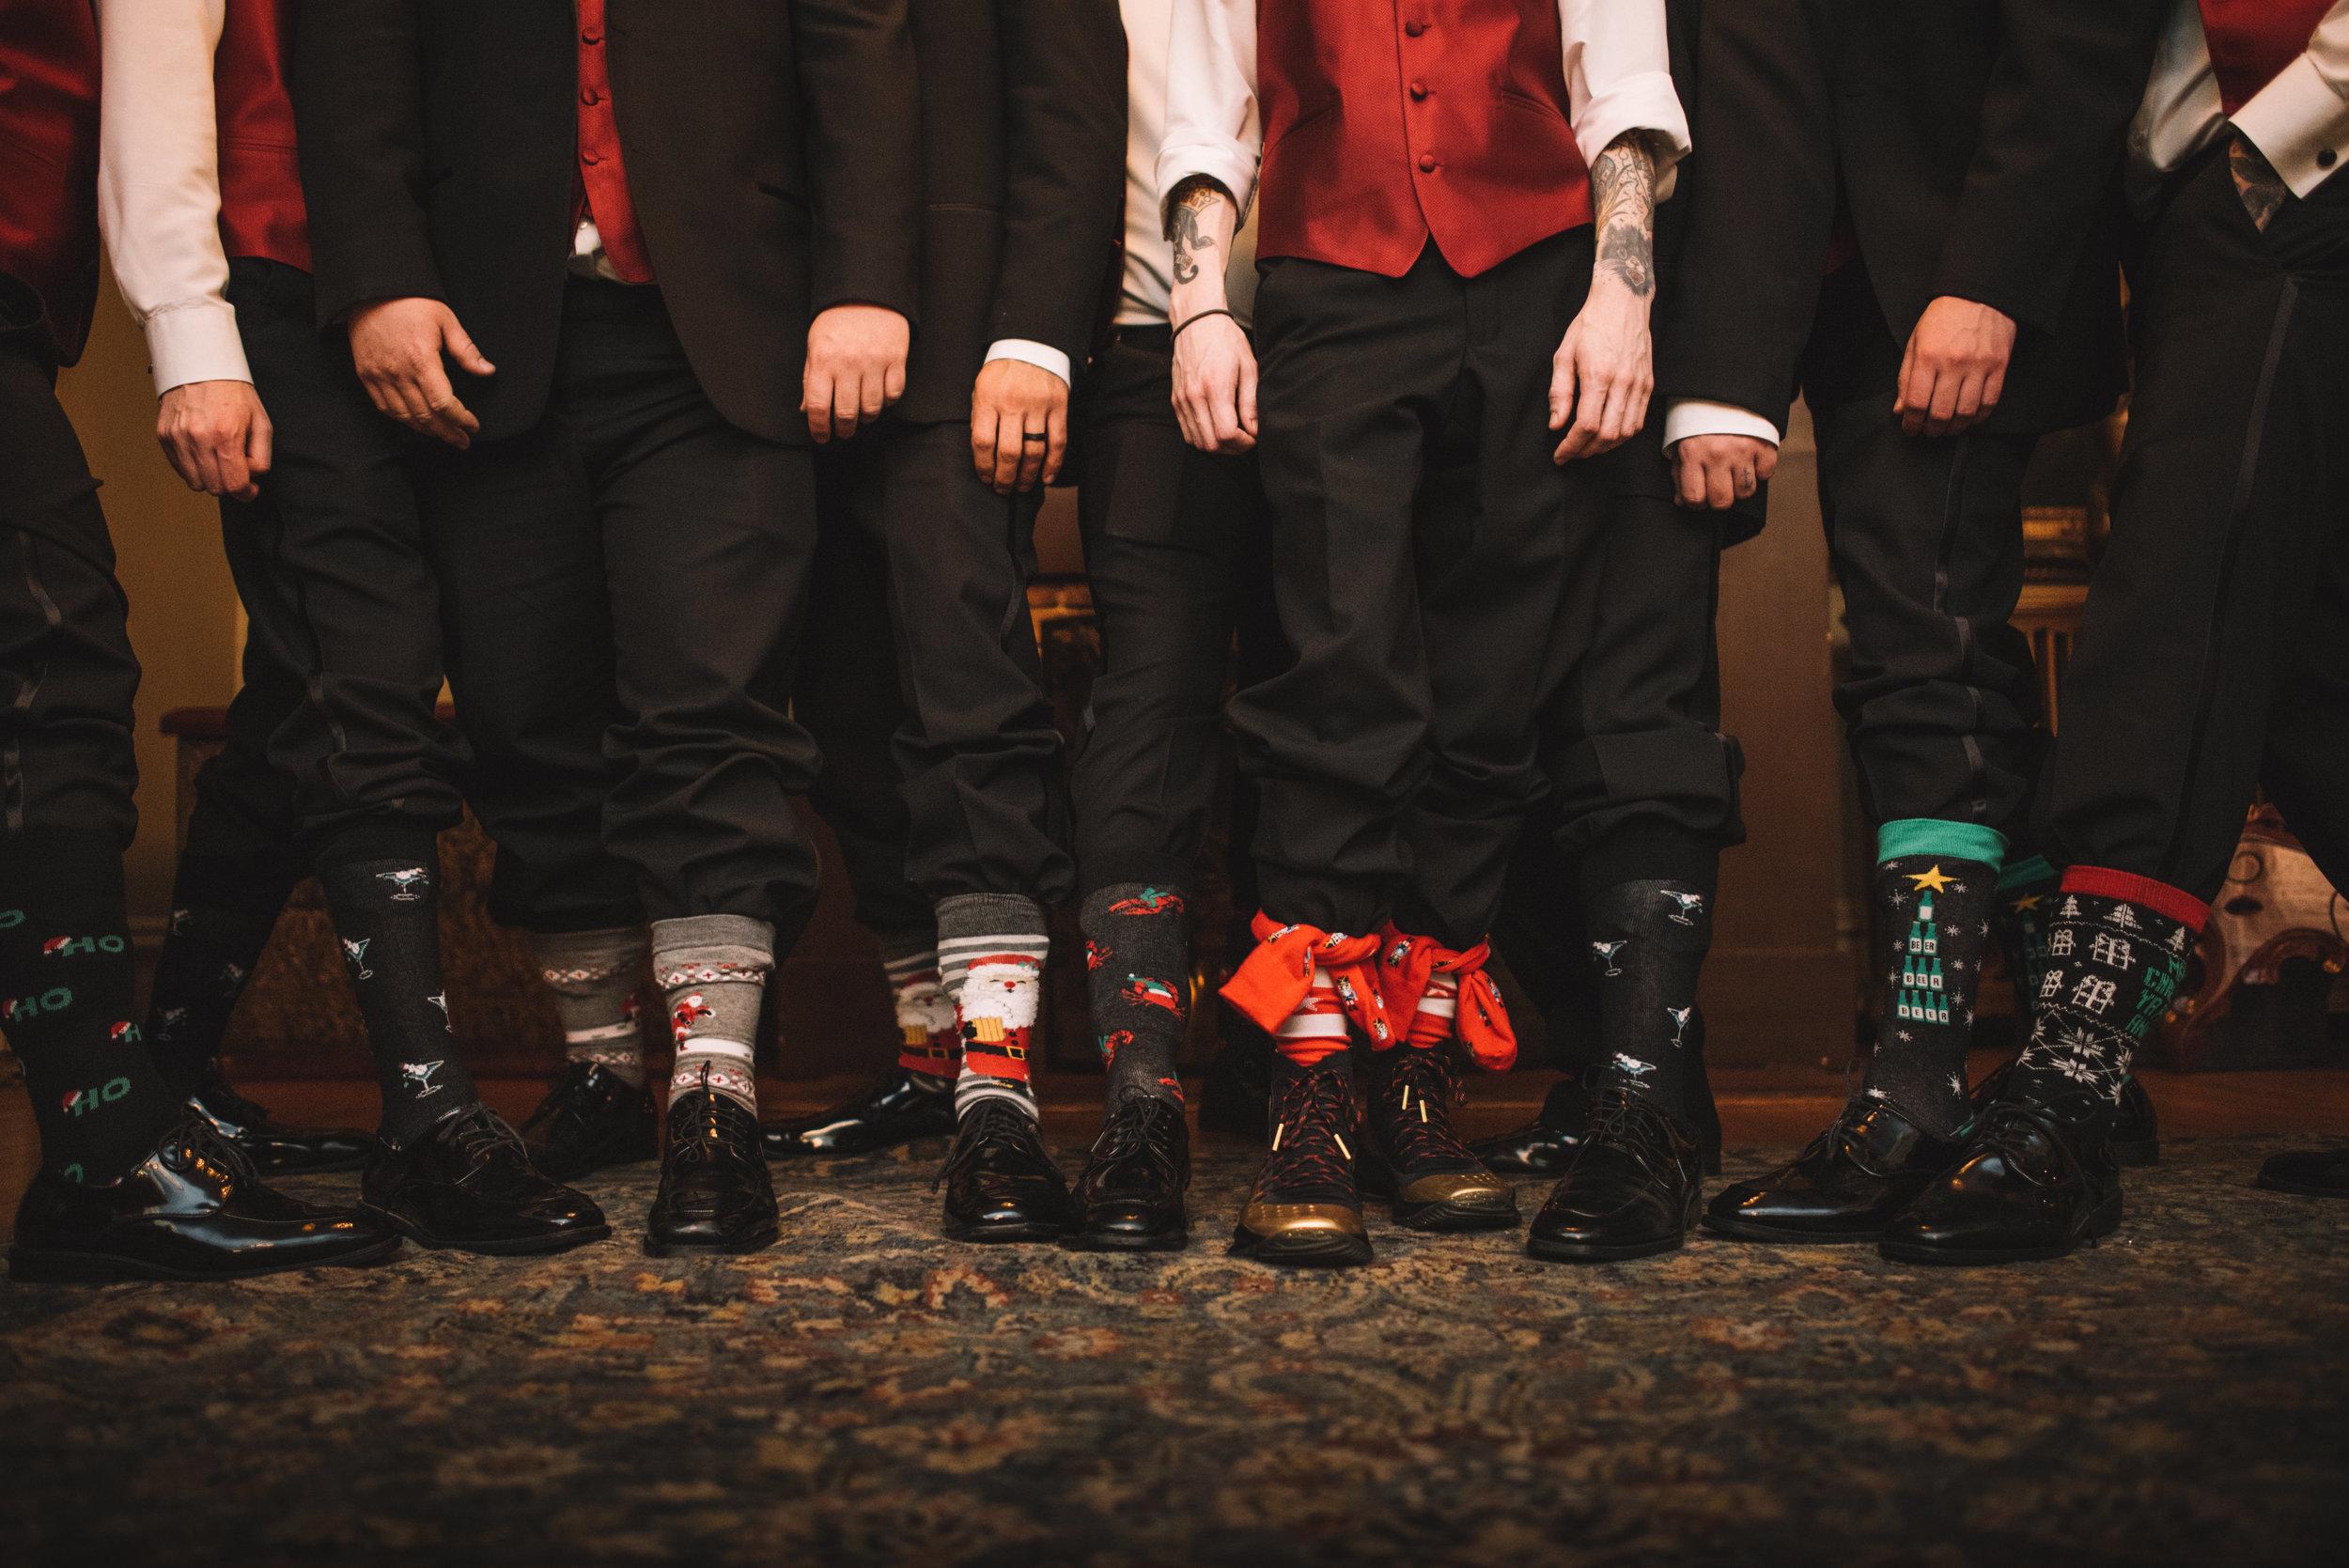 WeddingPhotos | NJPhotographer | Highlights-20-2.jpg